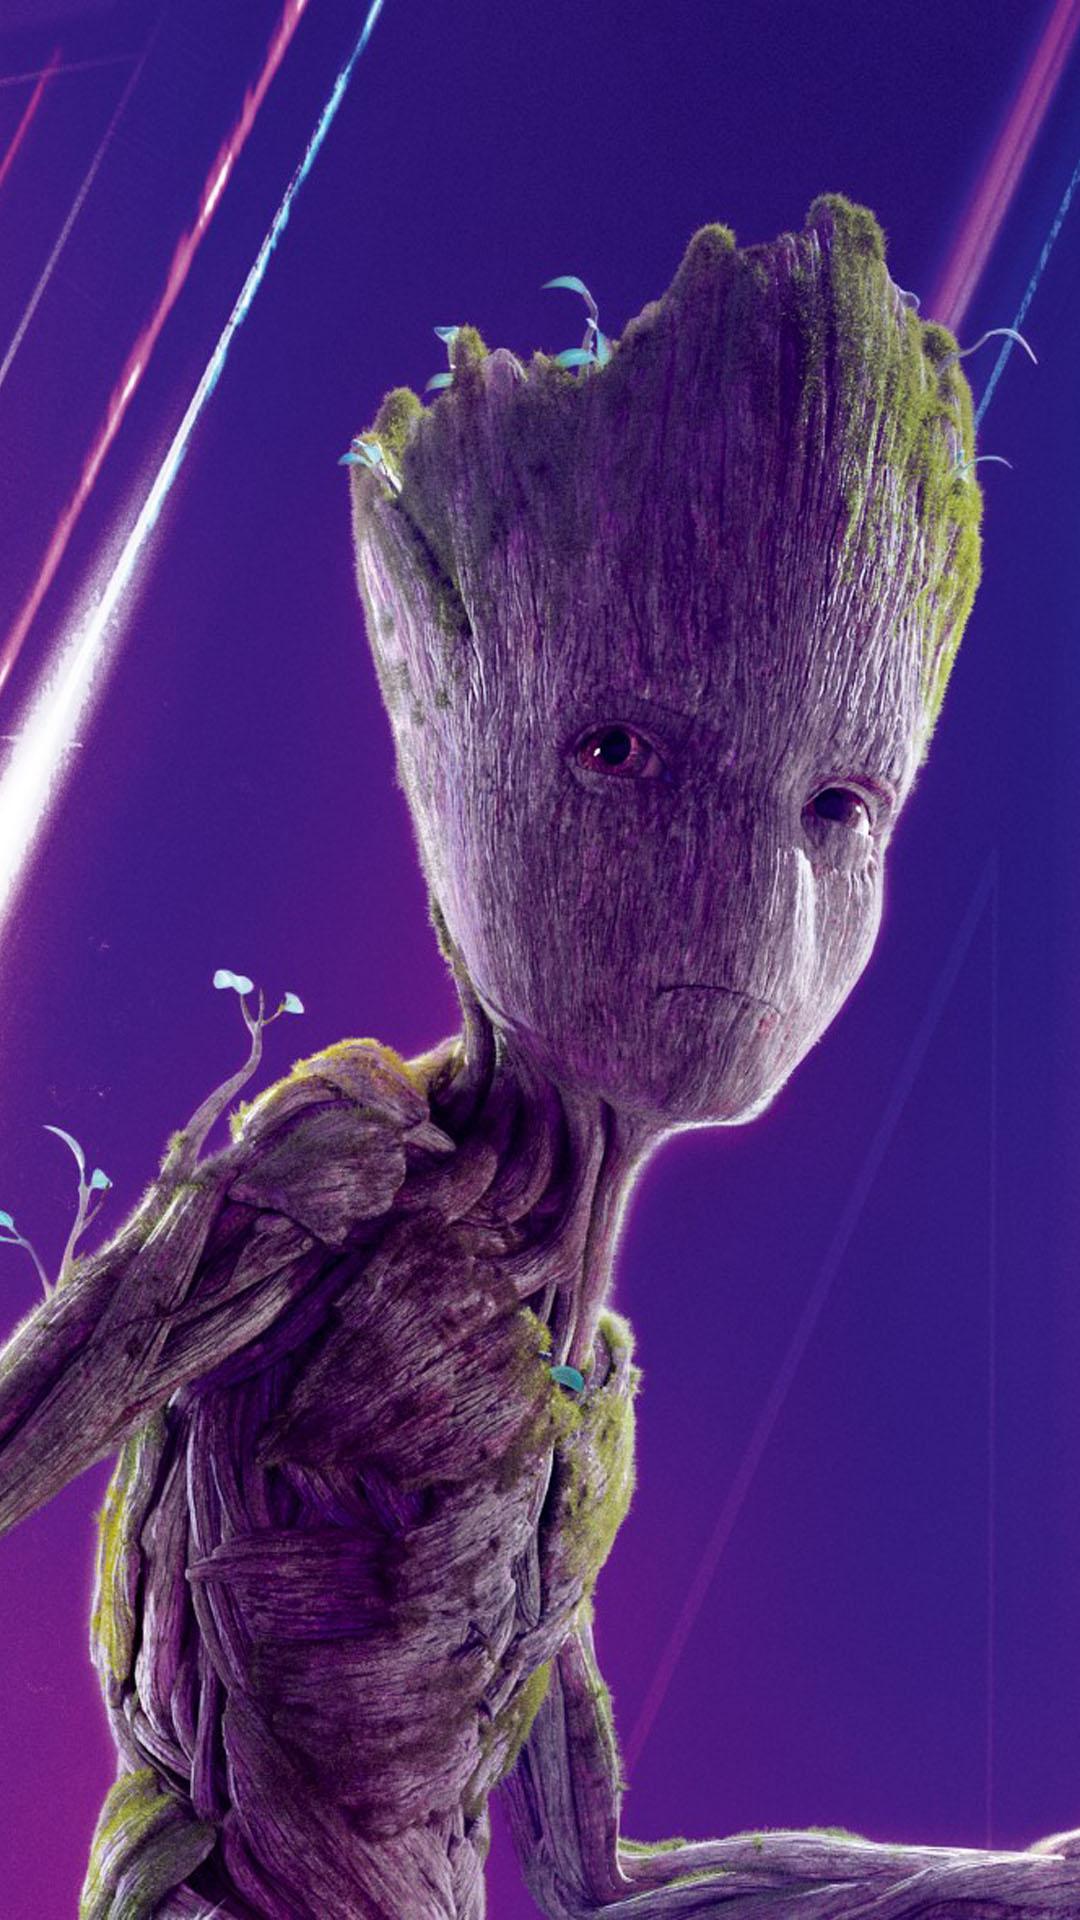 Download Groot In Avengers Infinity War Free Pure 4K Ultra HD Mobile